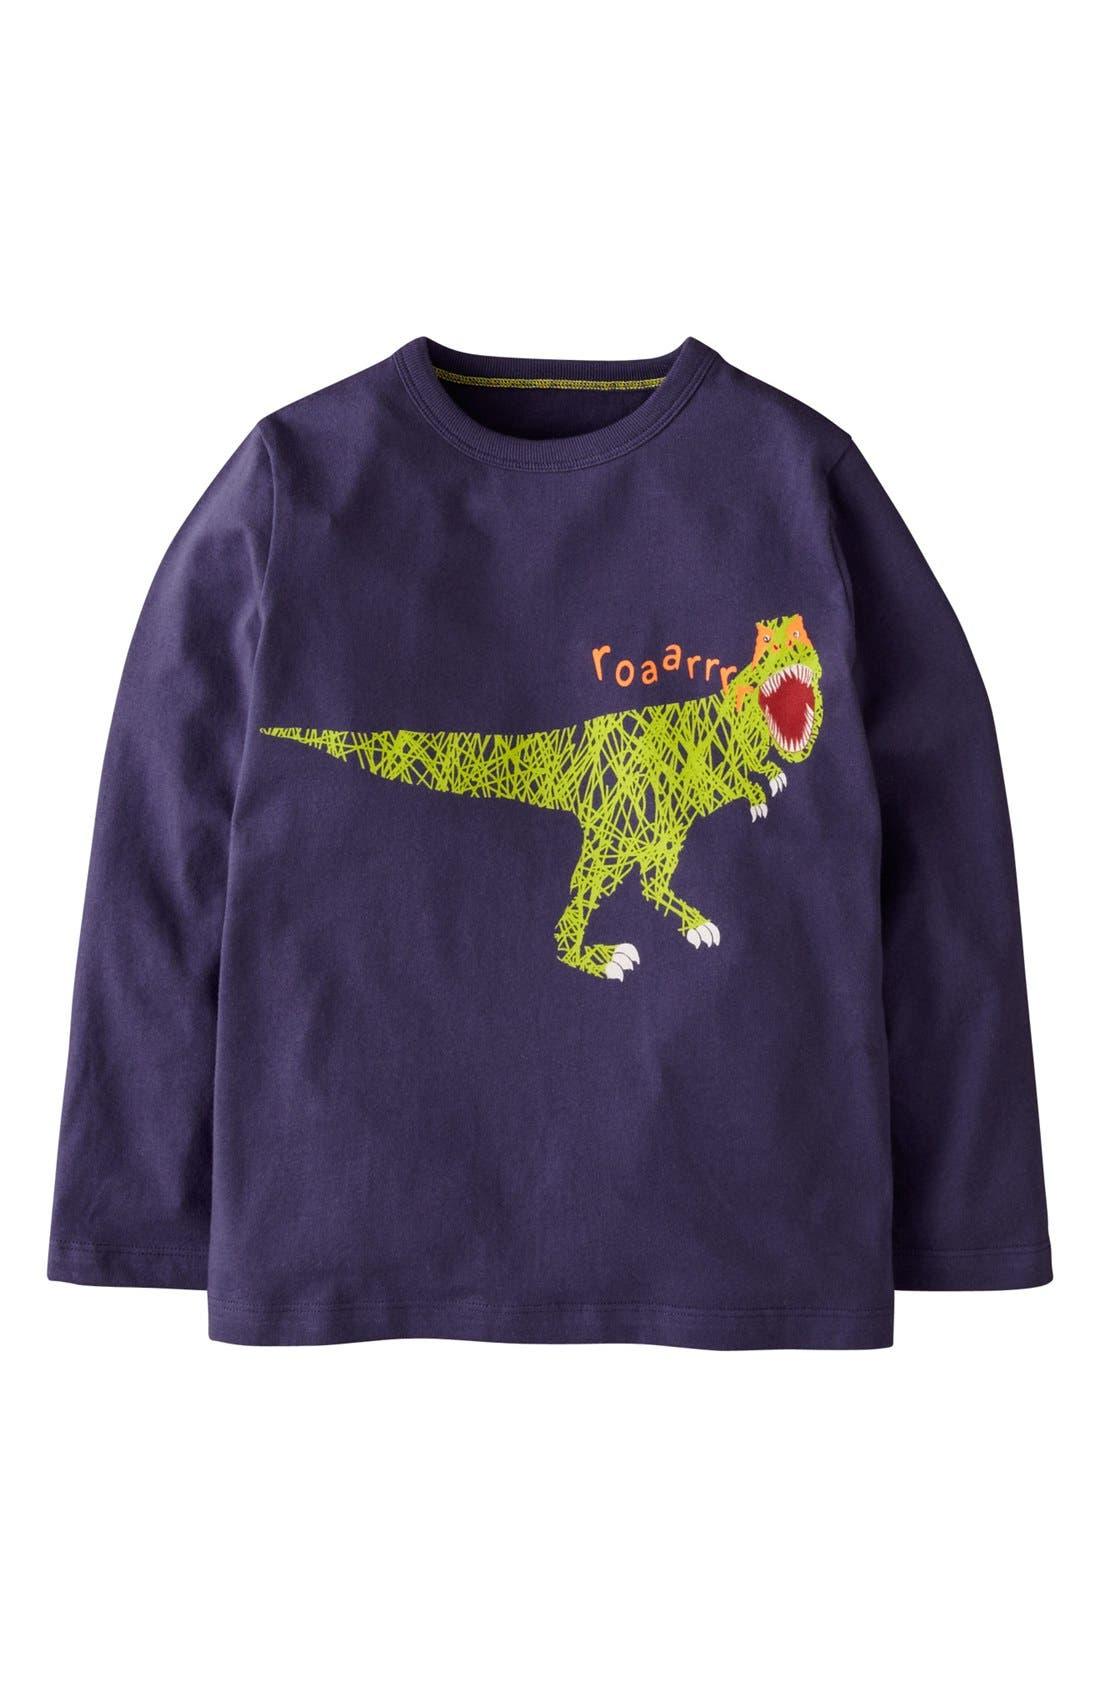 Alternate Image 1 Selected - Mini Boden 'Scribble Print' T-Shirt (Toddler Boys)